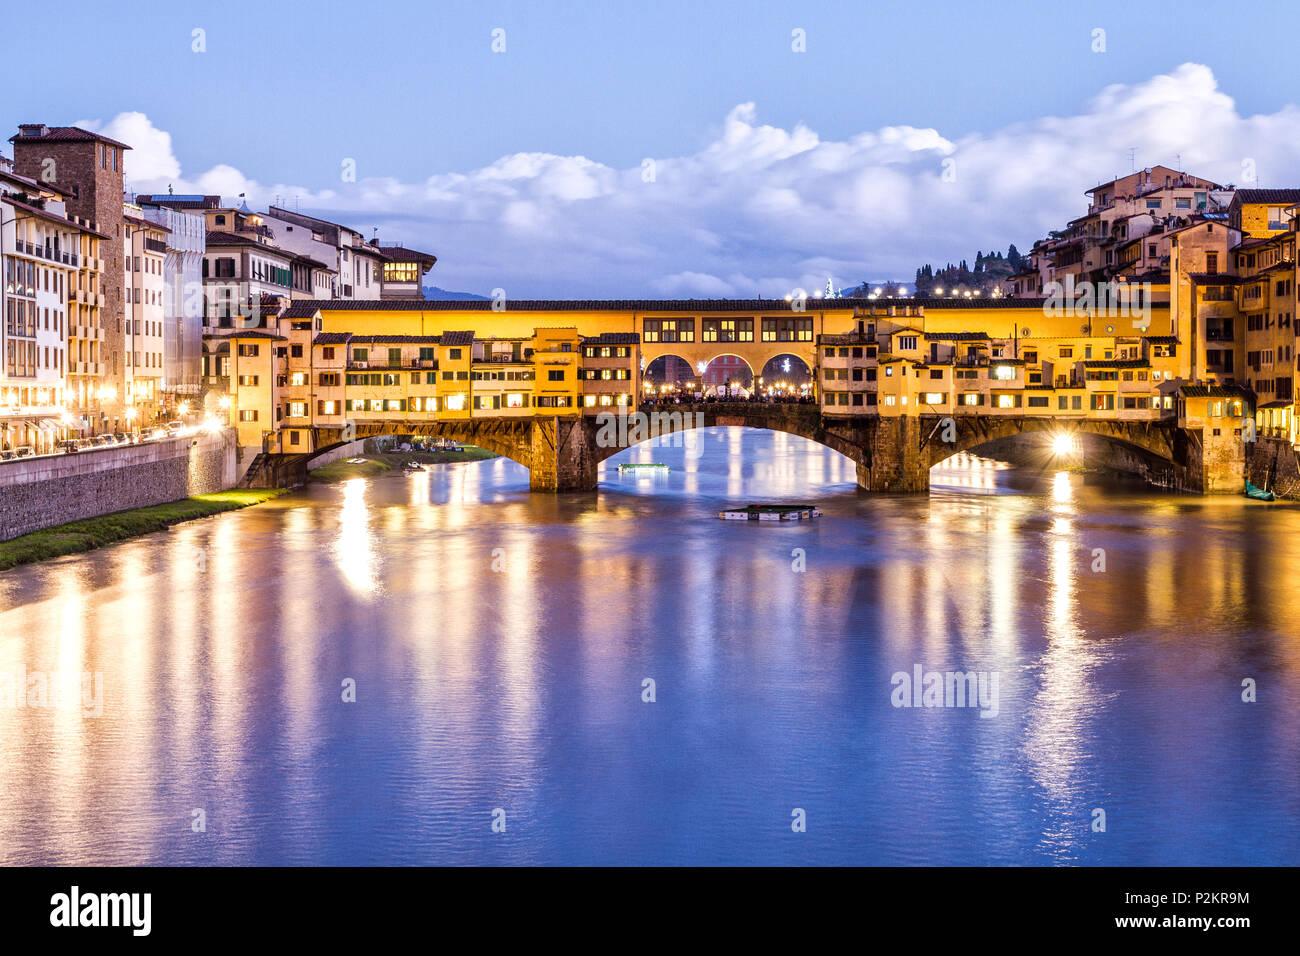 Ponte Vecchio (Alte Brücke) am Abend. Florenz, Provinz Florenz, Italien. Stockbild